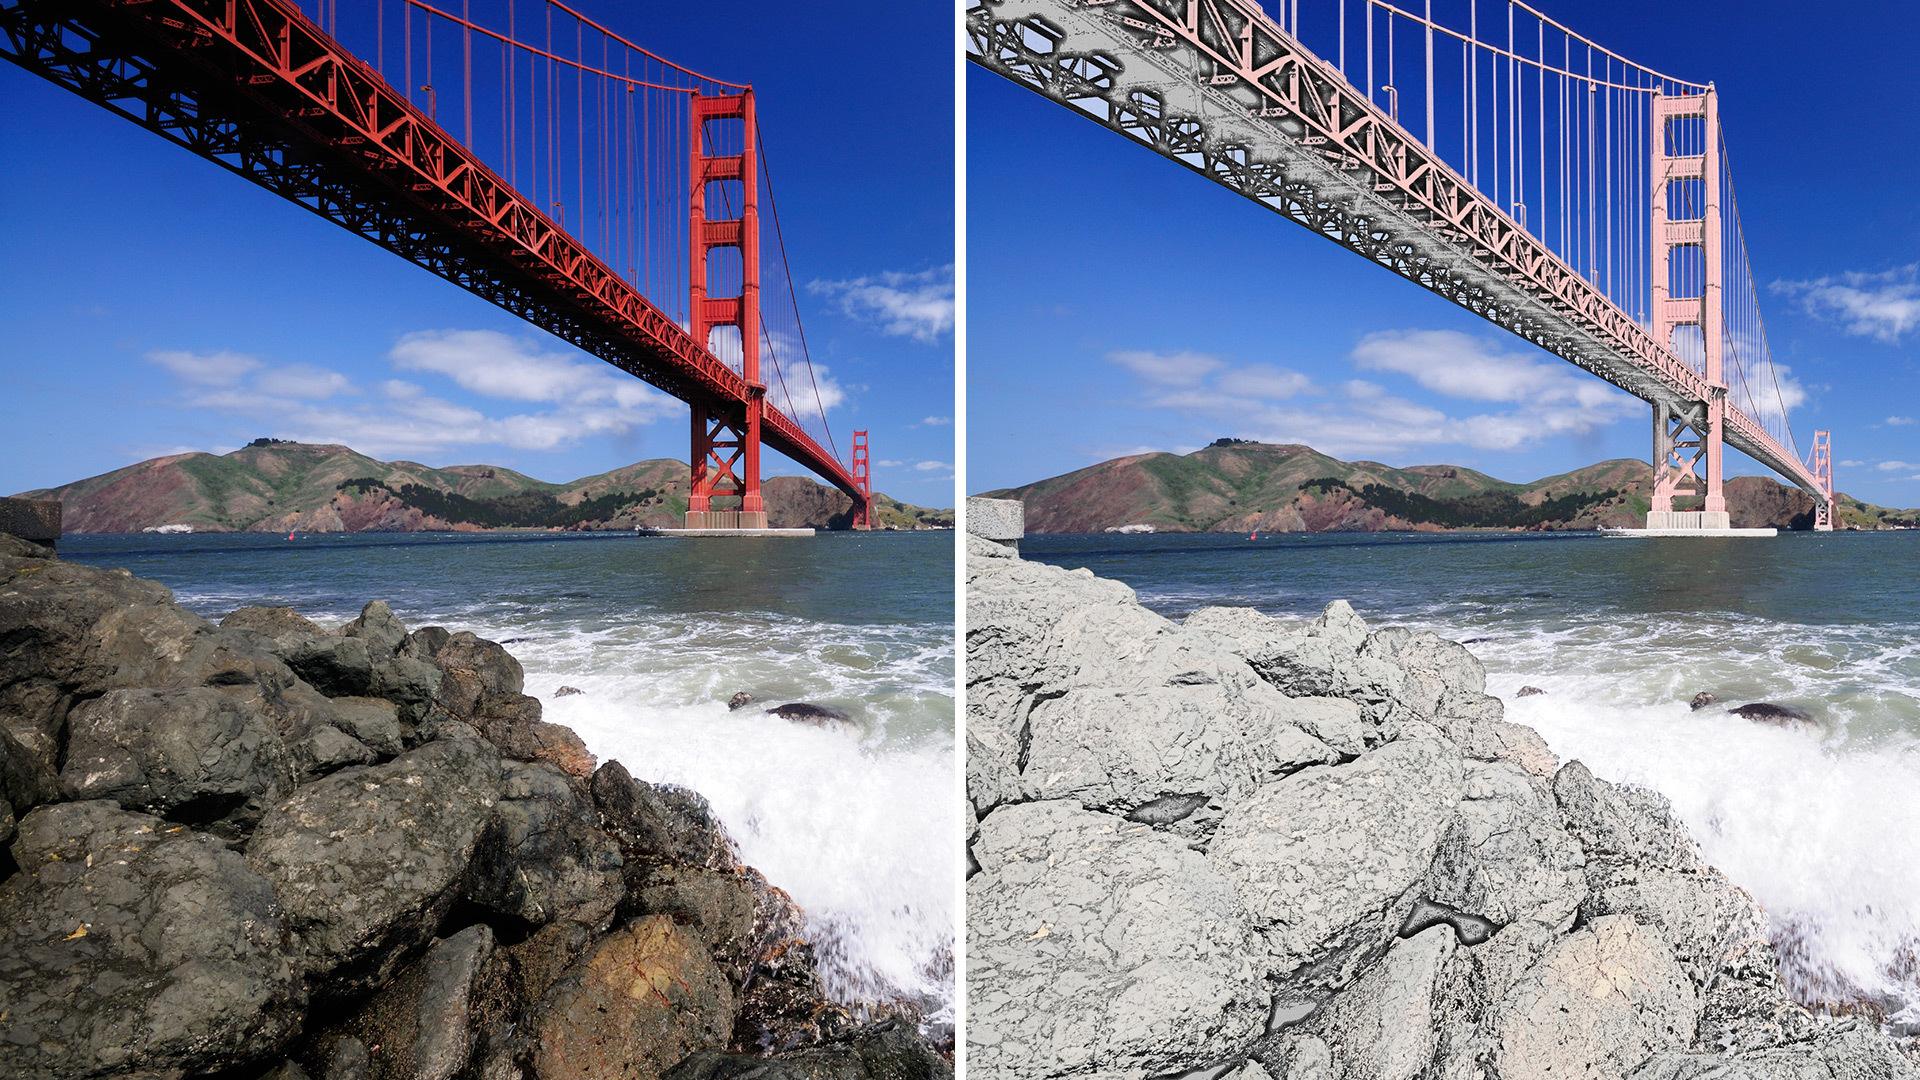 Photoshop Elements update targets new photographers